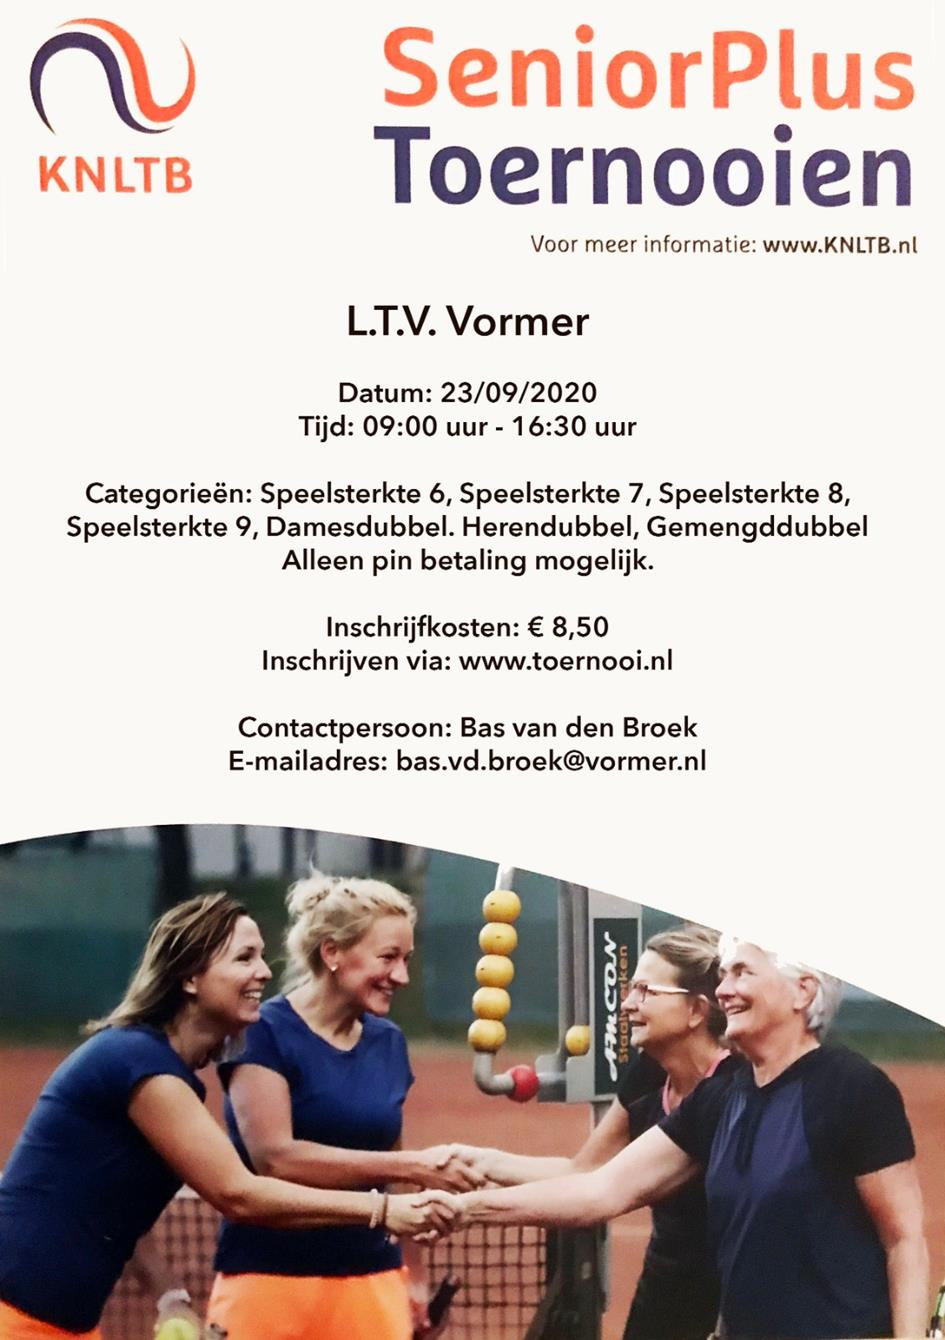 L.T.V. Vormer 50+.JPG